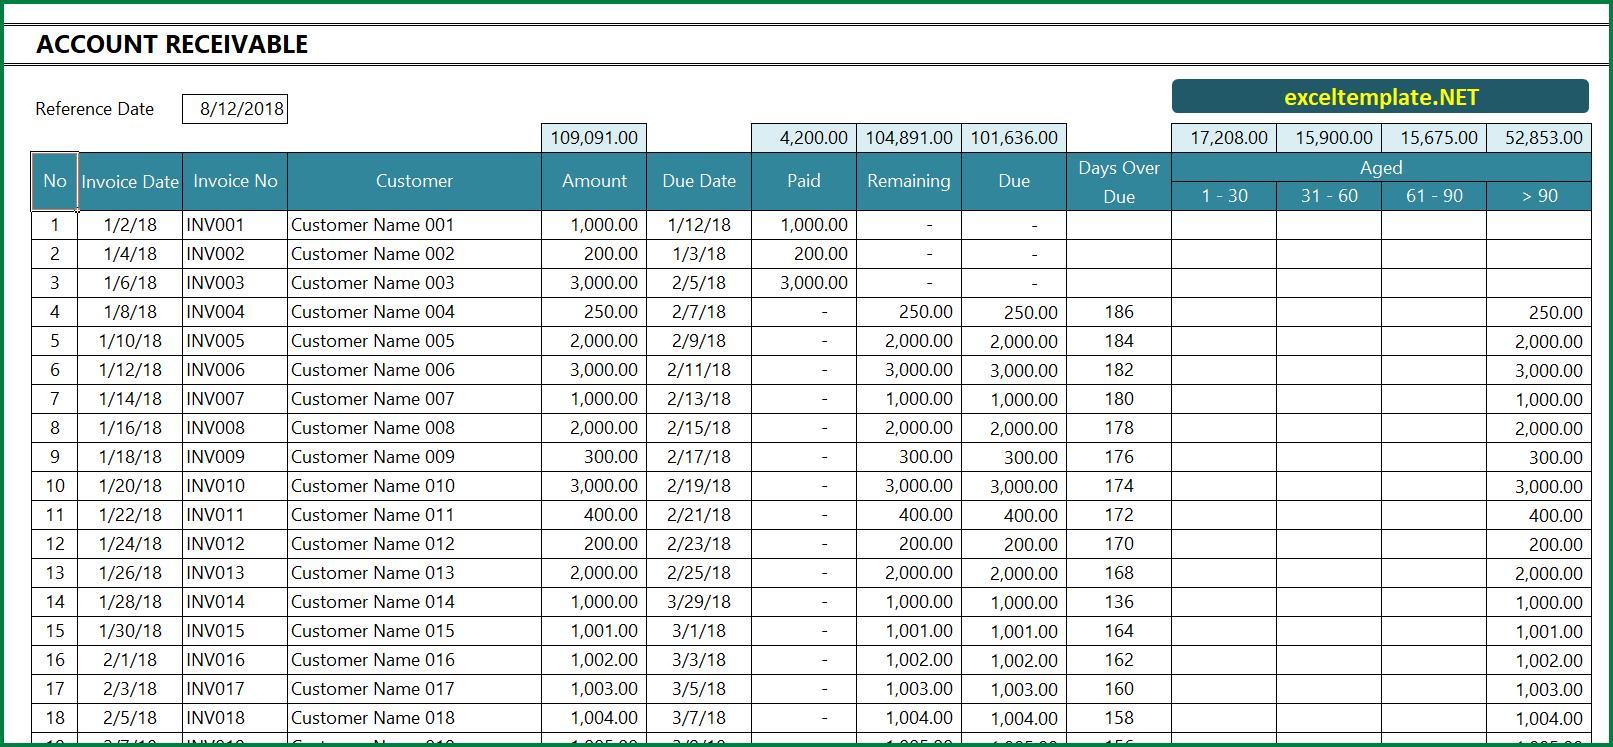 Account Receivable | Excel Templates